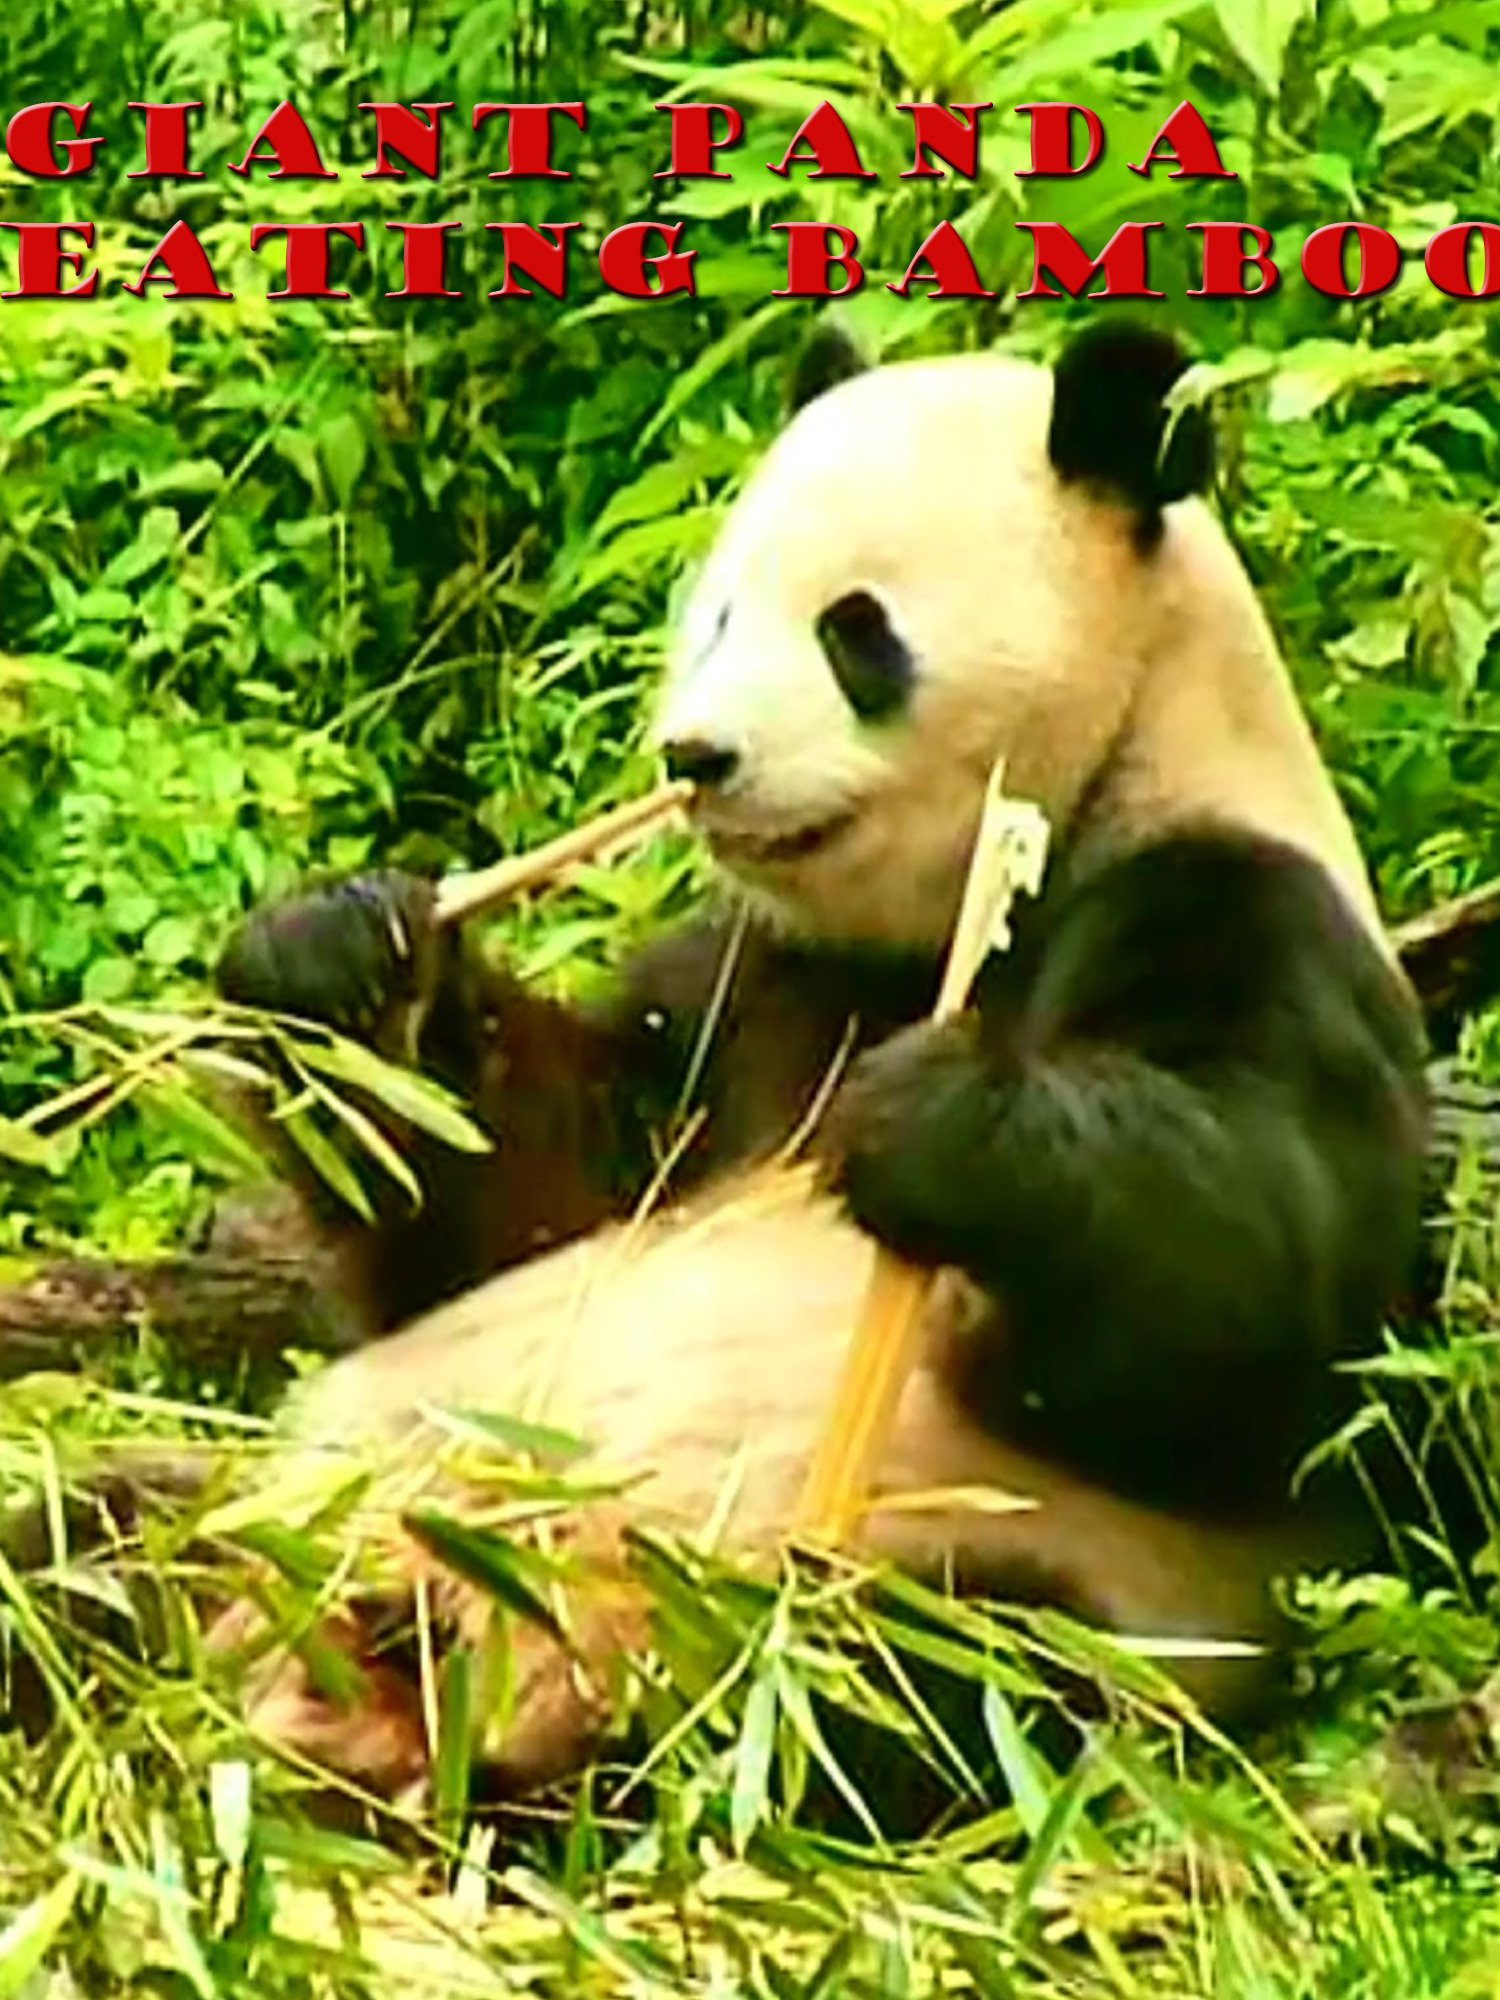 Clip: Giant Panda Eating Bamboo